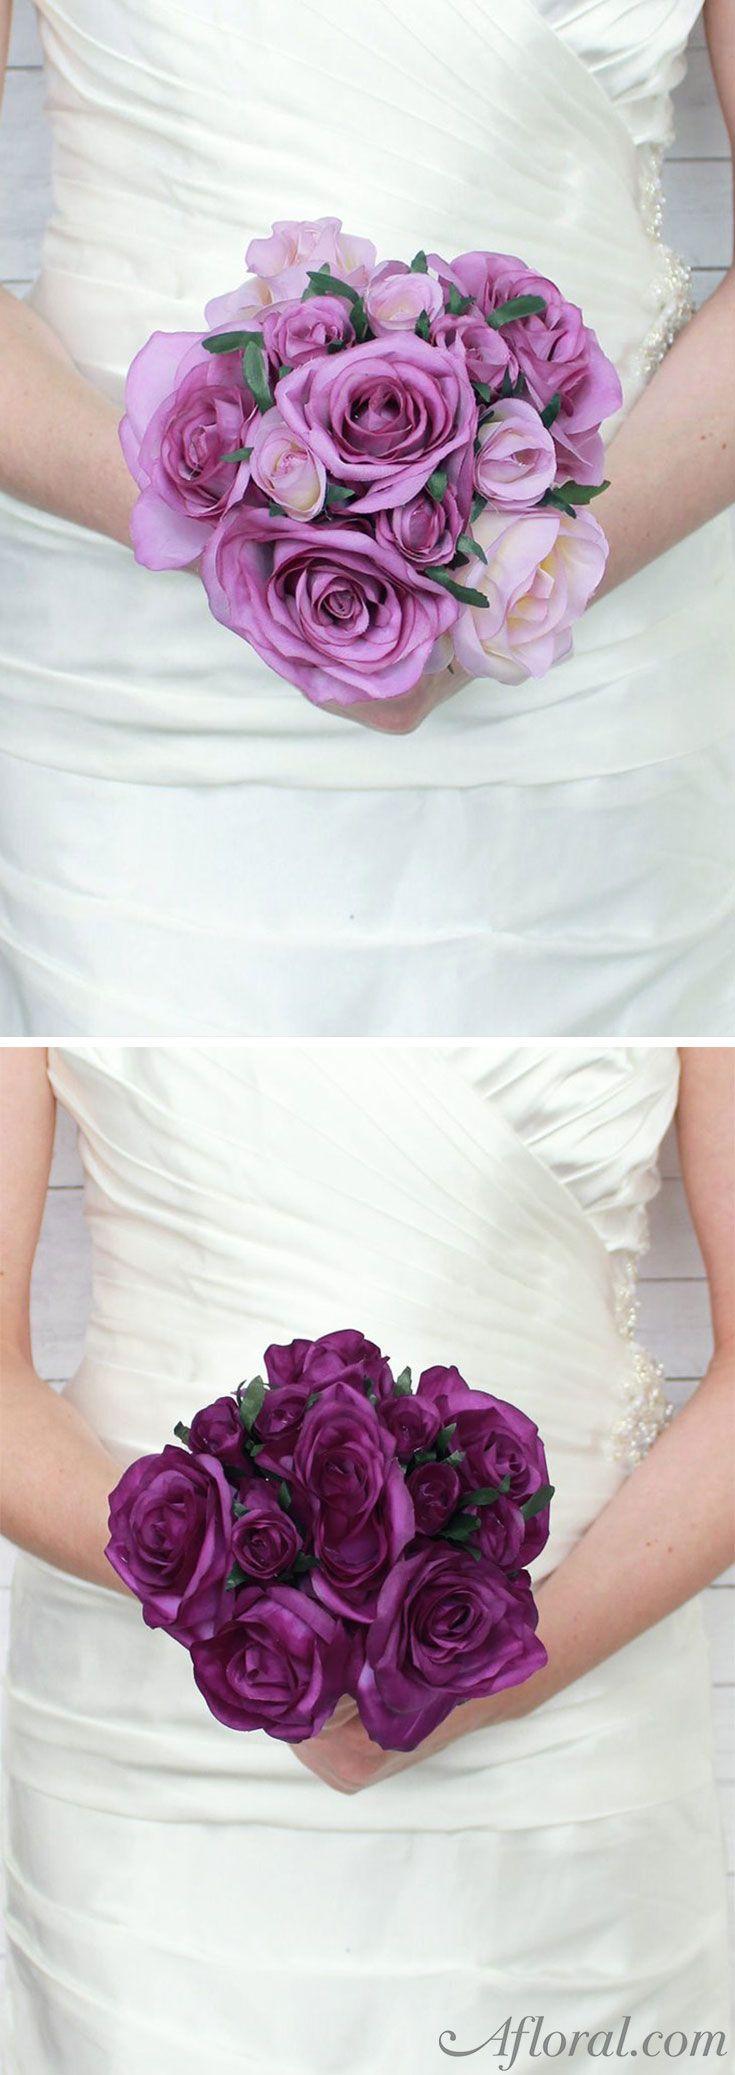 Pre-Made Silk Flower Bouquet | Bridal Bouquets | Pinterest | Silk ...